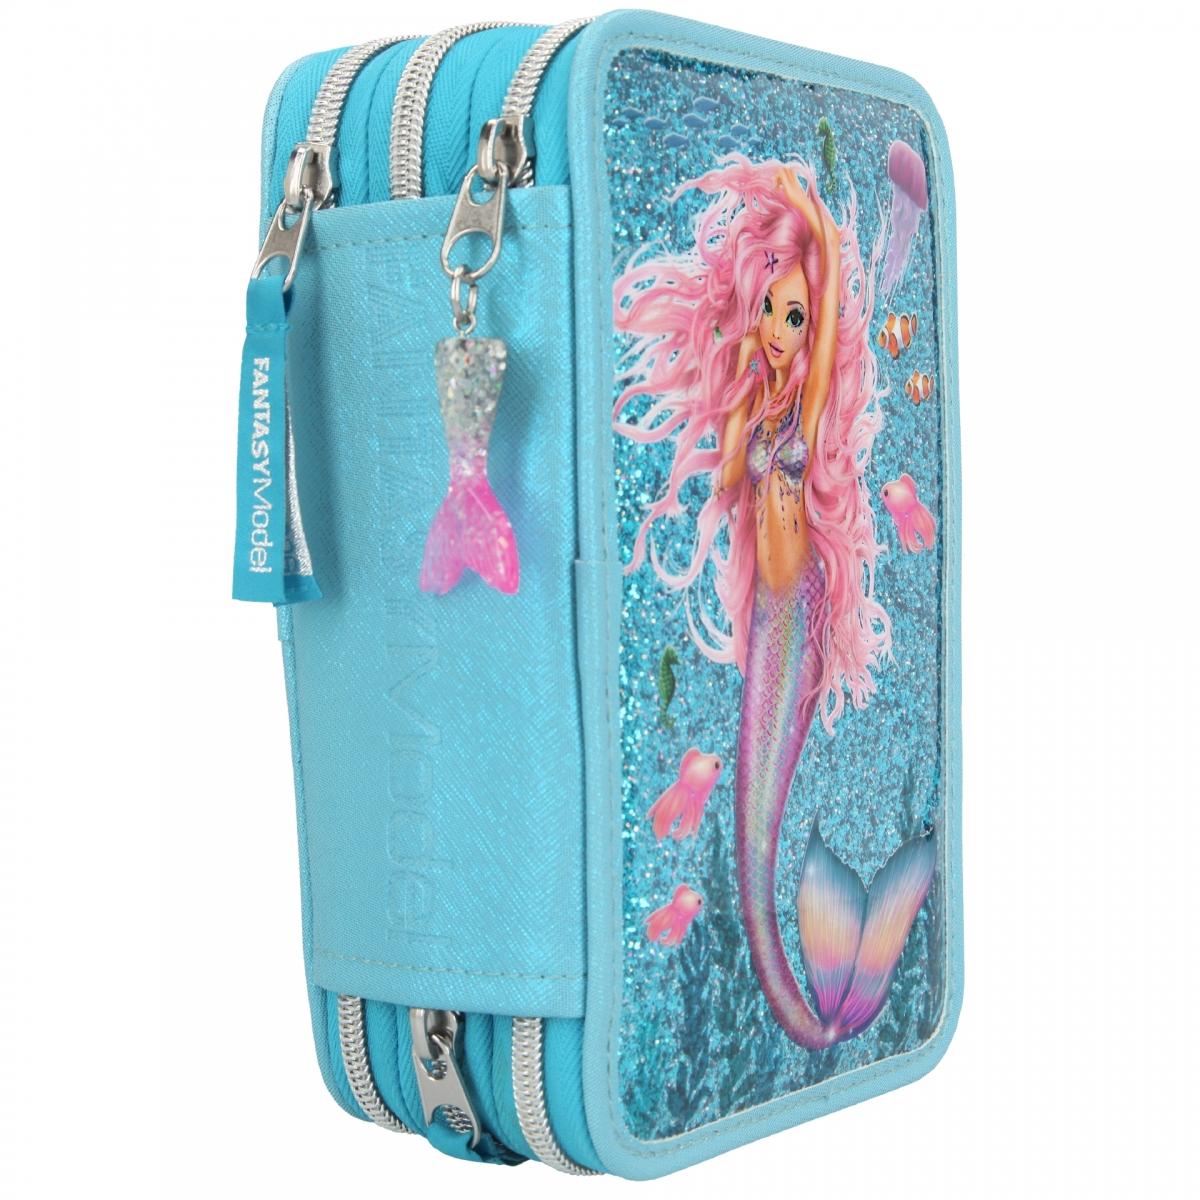 ,Fantasy model 3-vaks etui gevu ld mermaid